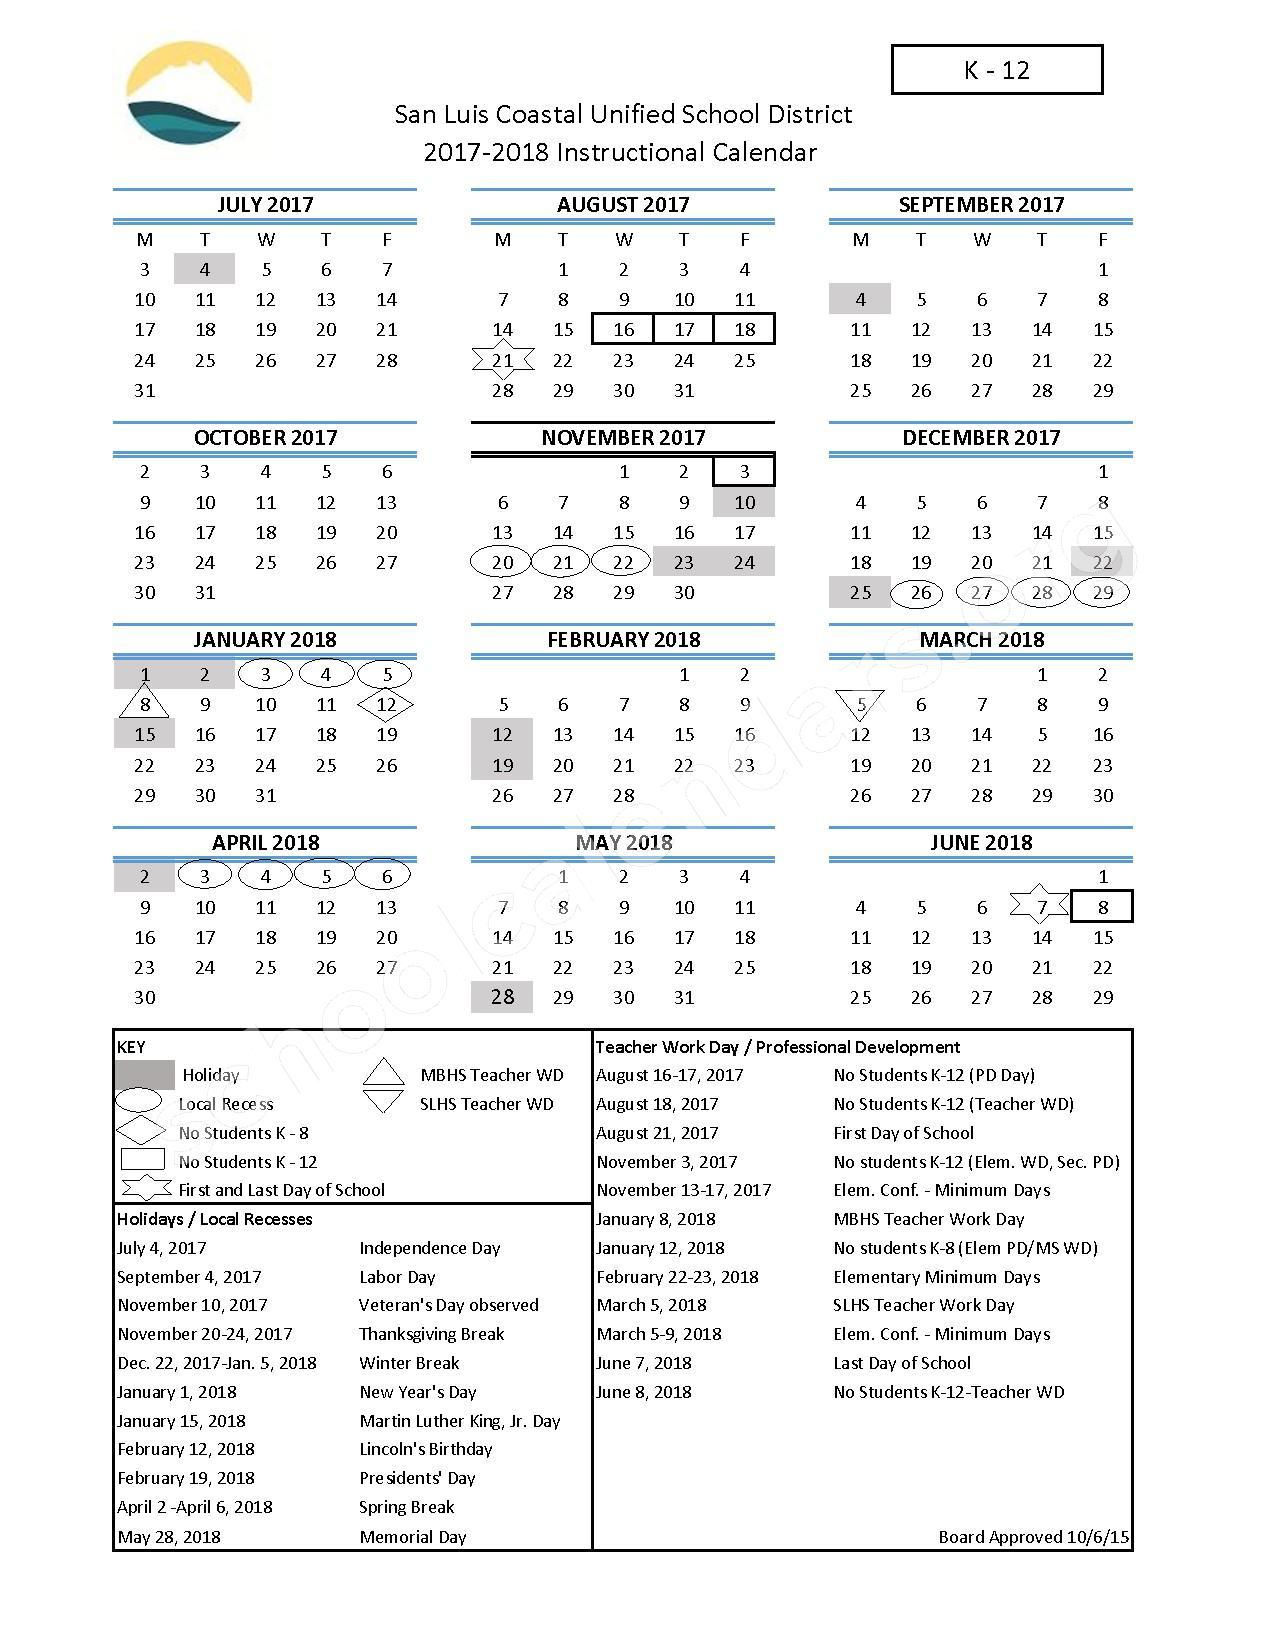 2017 - 2018 District Calendar (K-12) – San Luis Coastal Unified School District – page 1